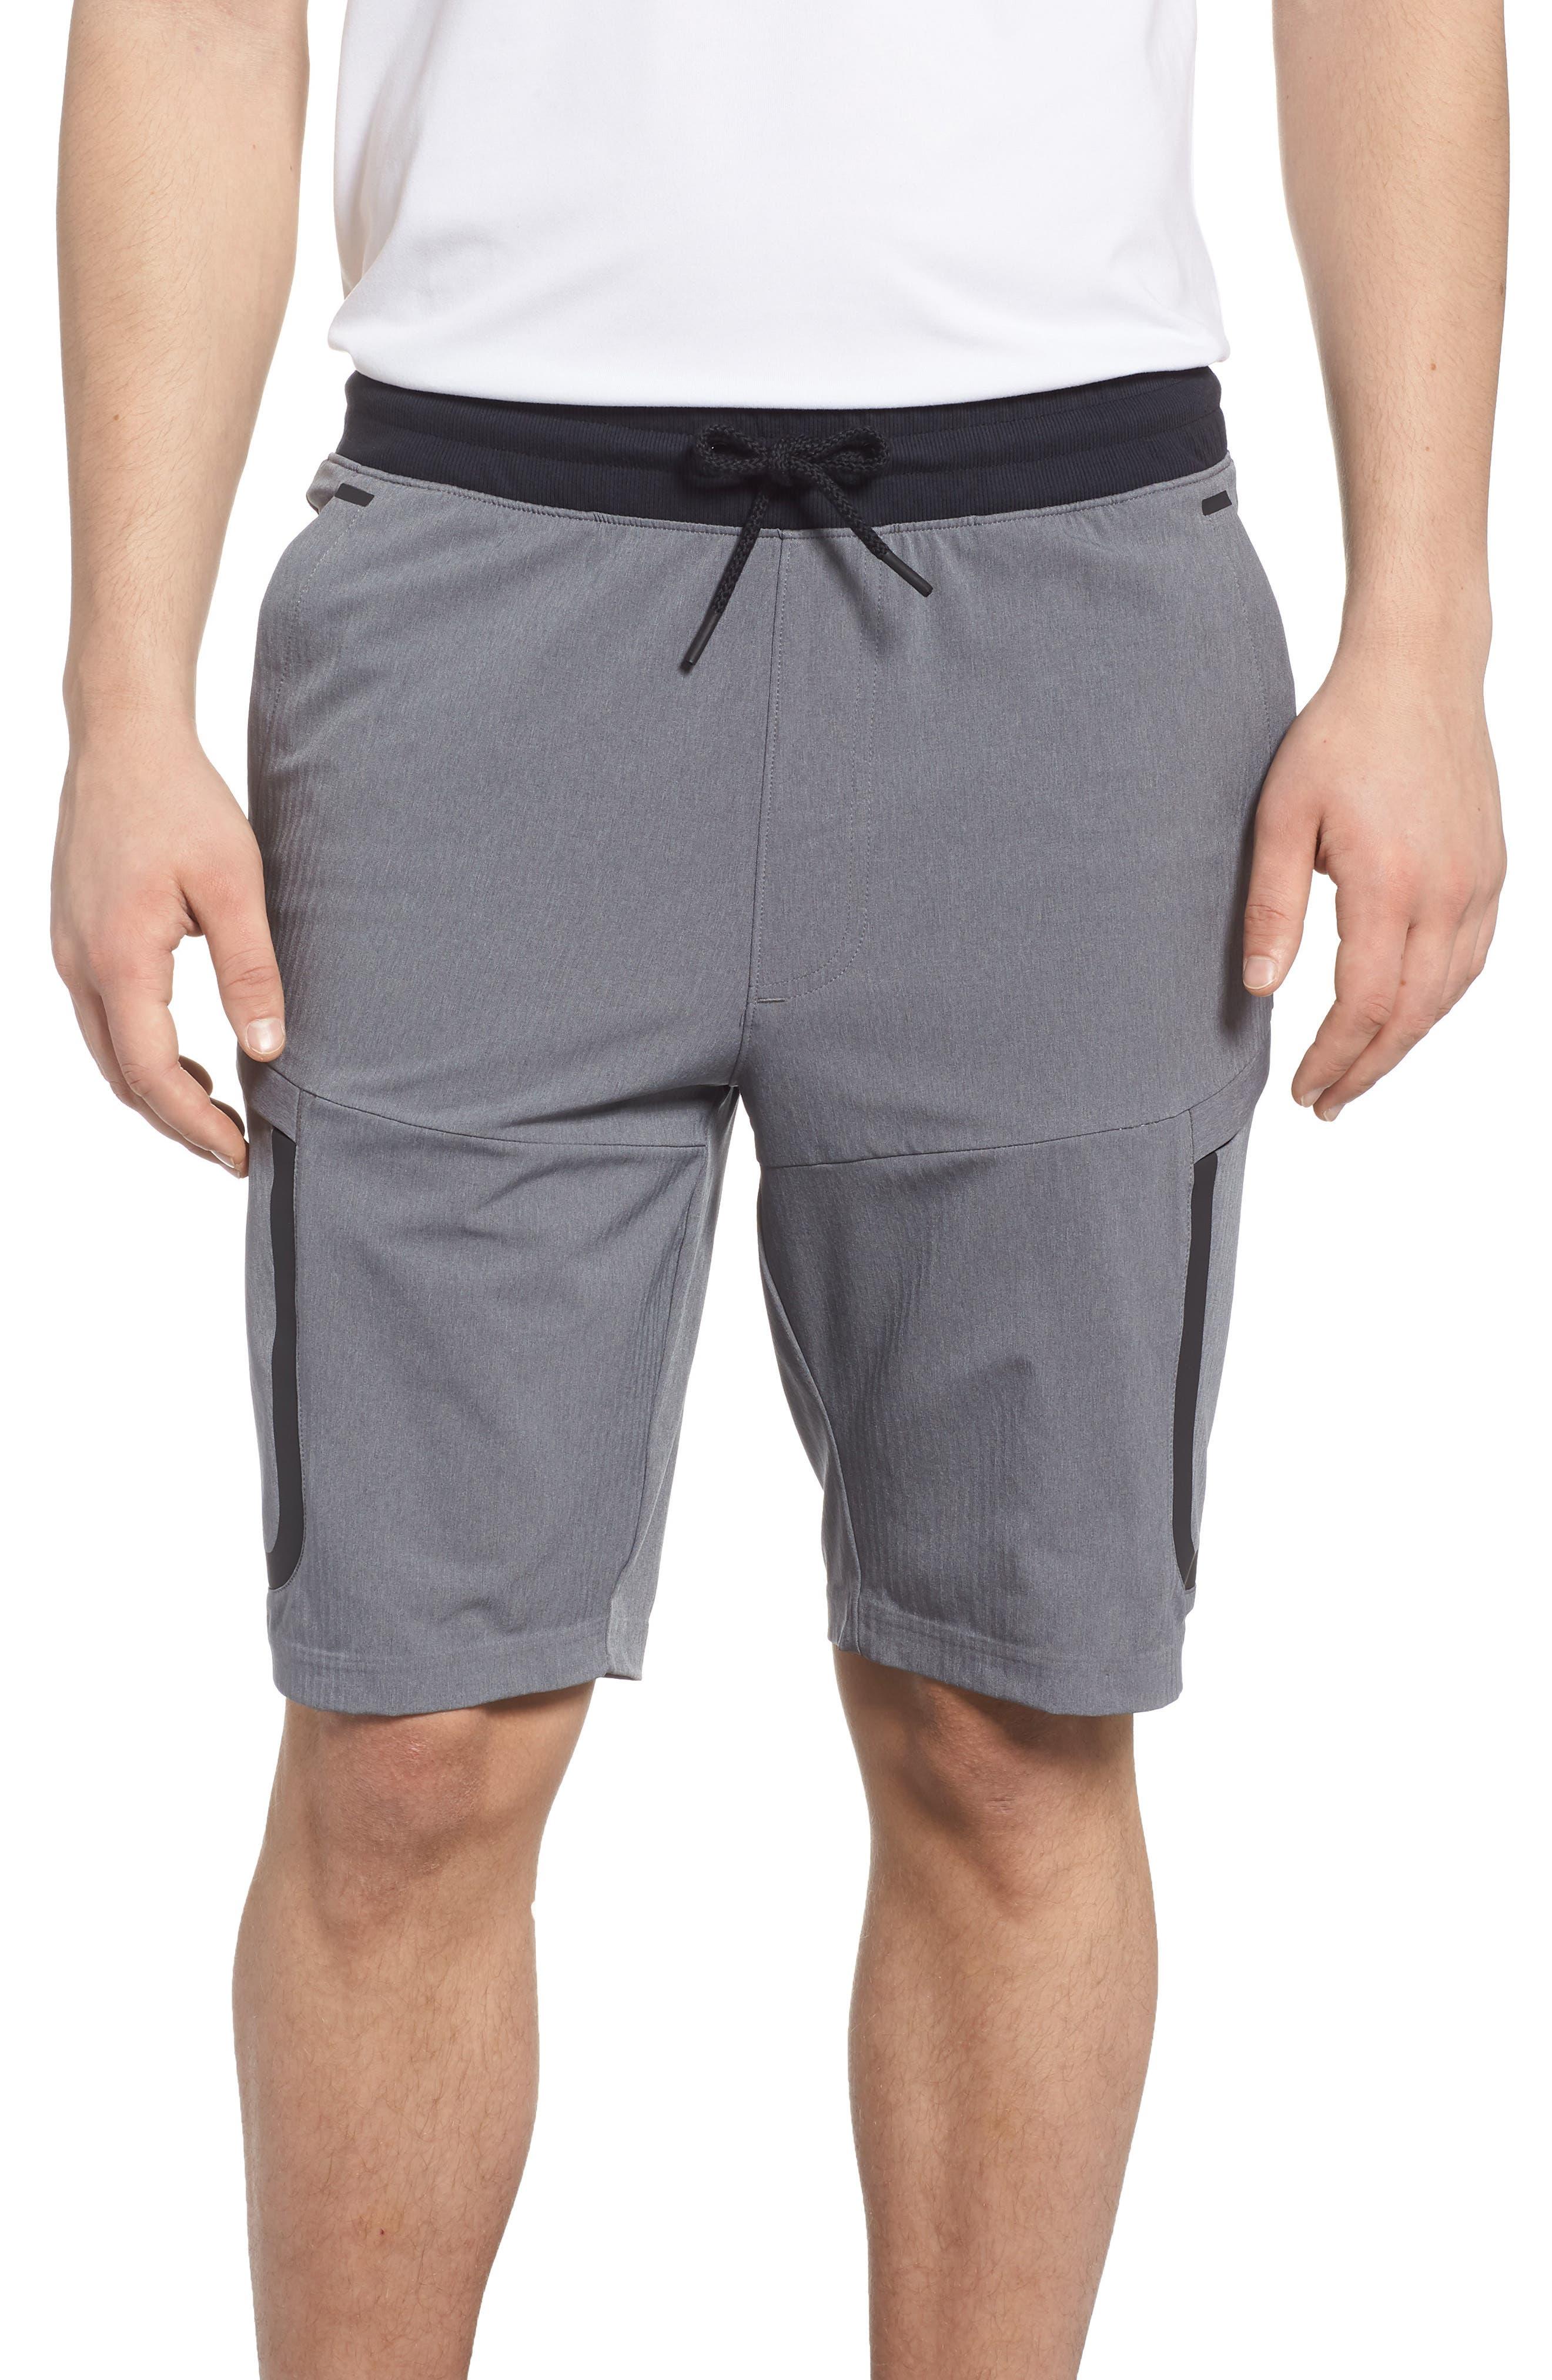 Under Armour Sportstyle Elite Cargo Shorts